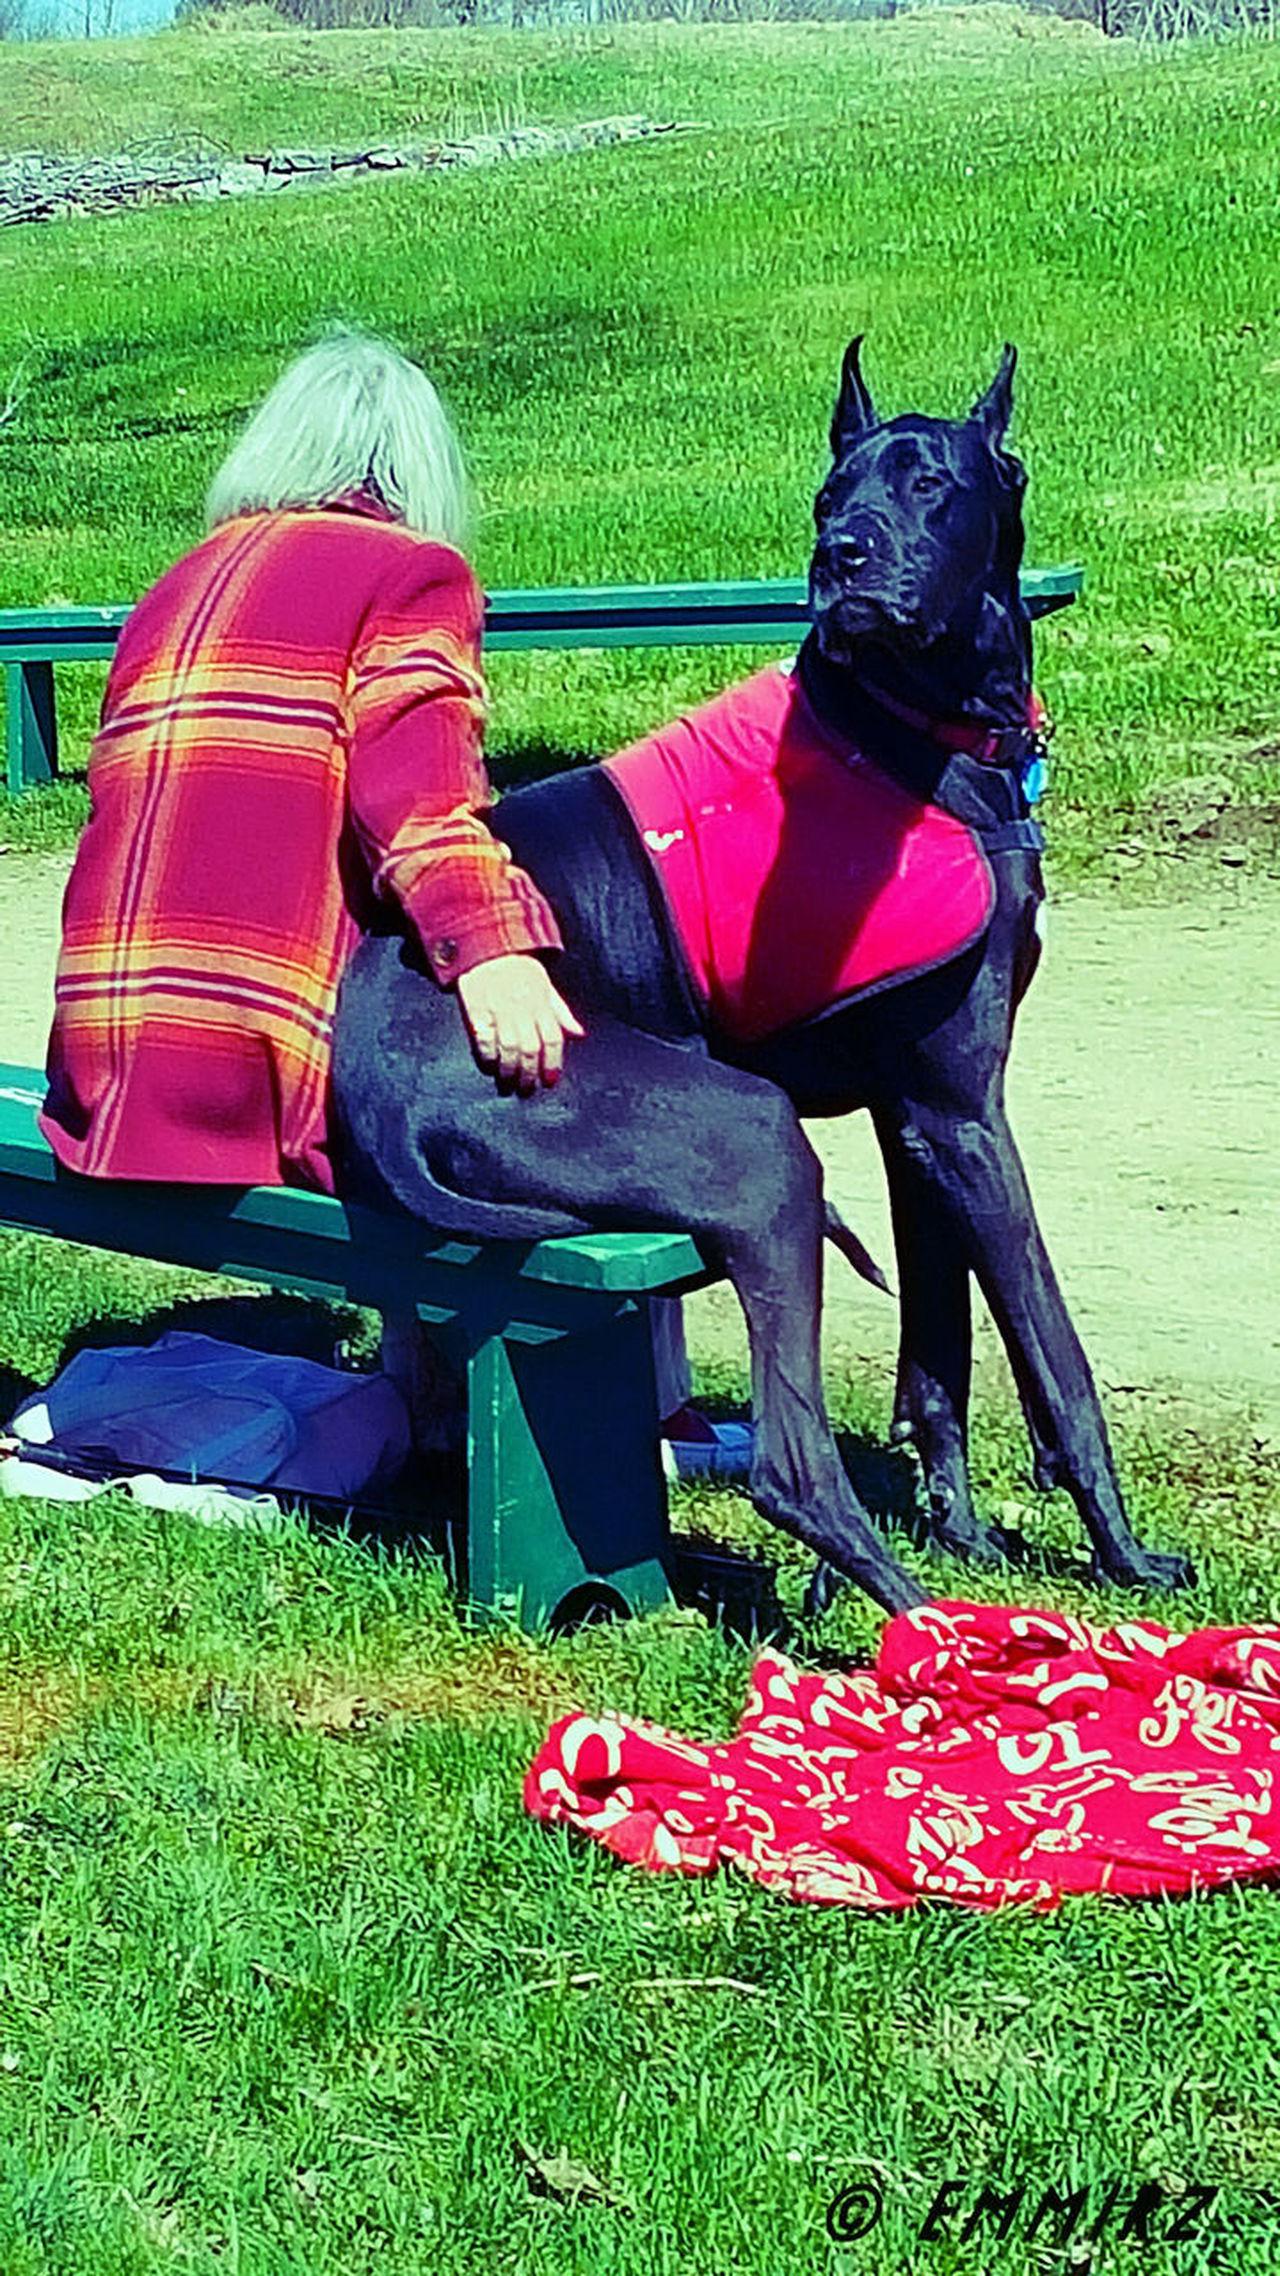 Womans/mans Bestfriend And Protector Bodygaurd Dogslife Doglover Doggy Love Best Friends ❤